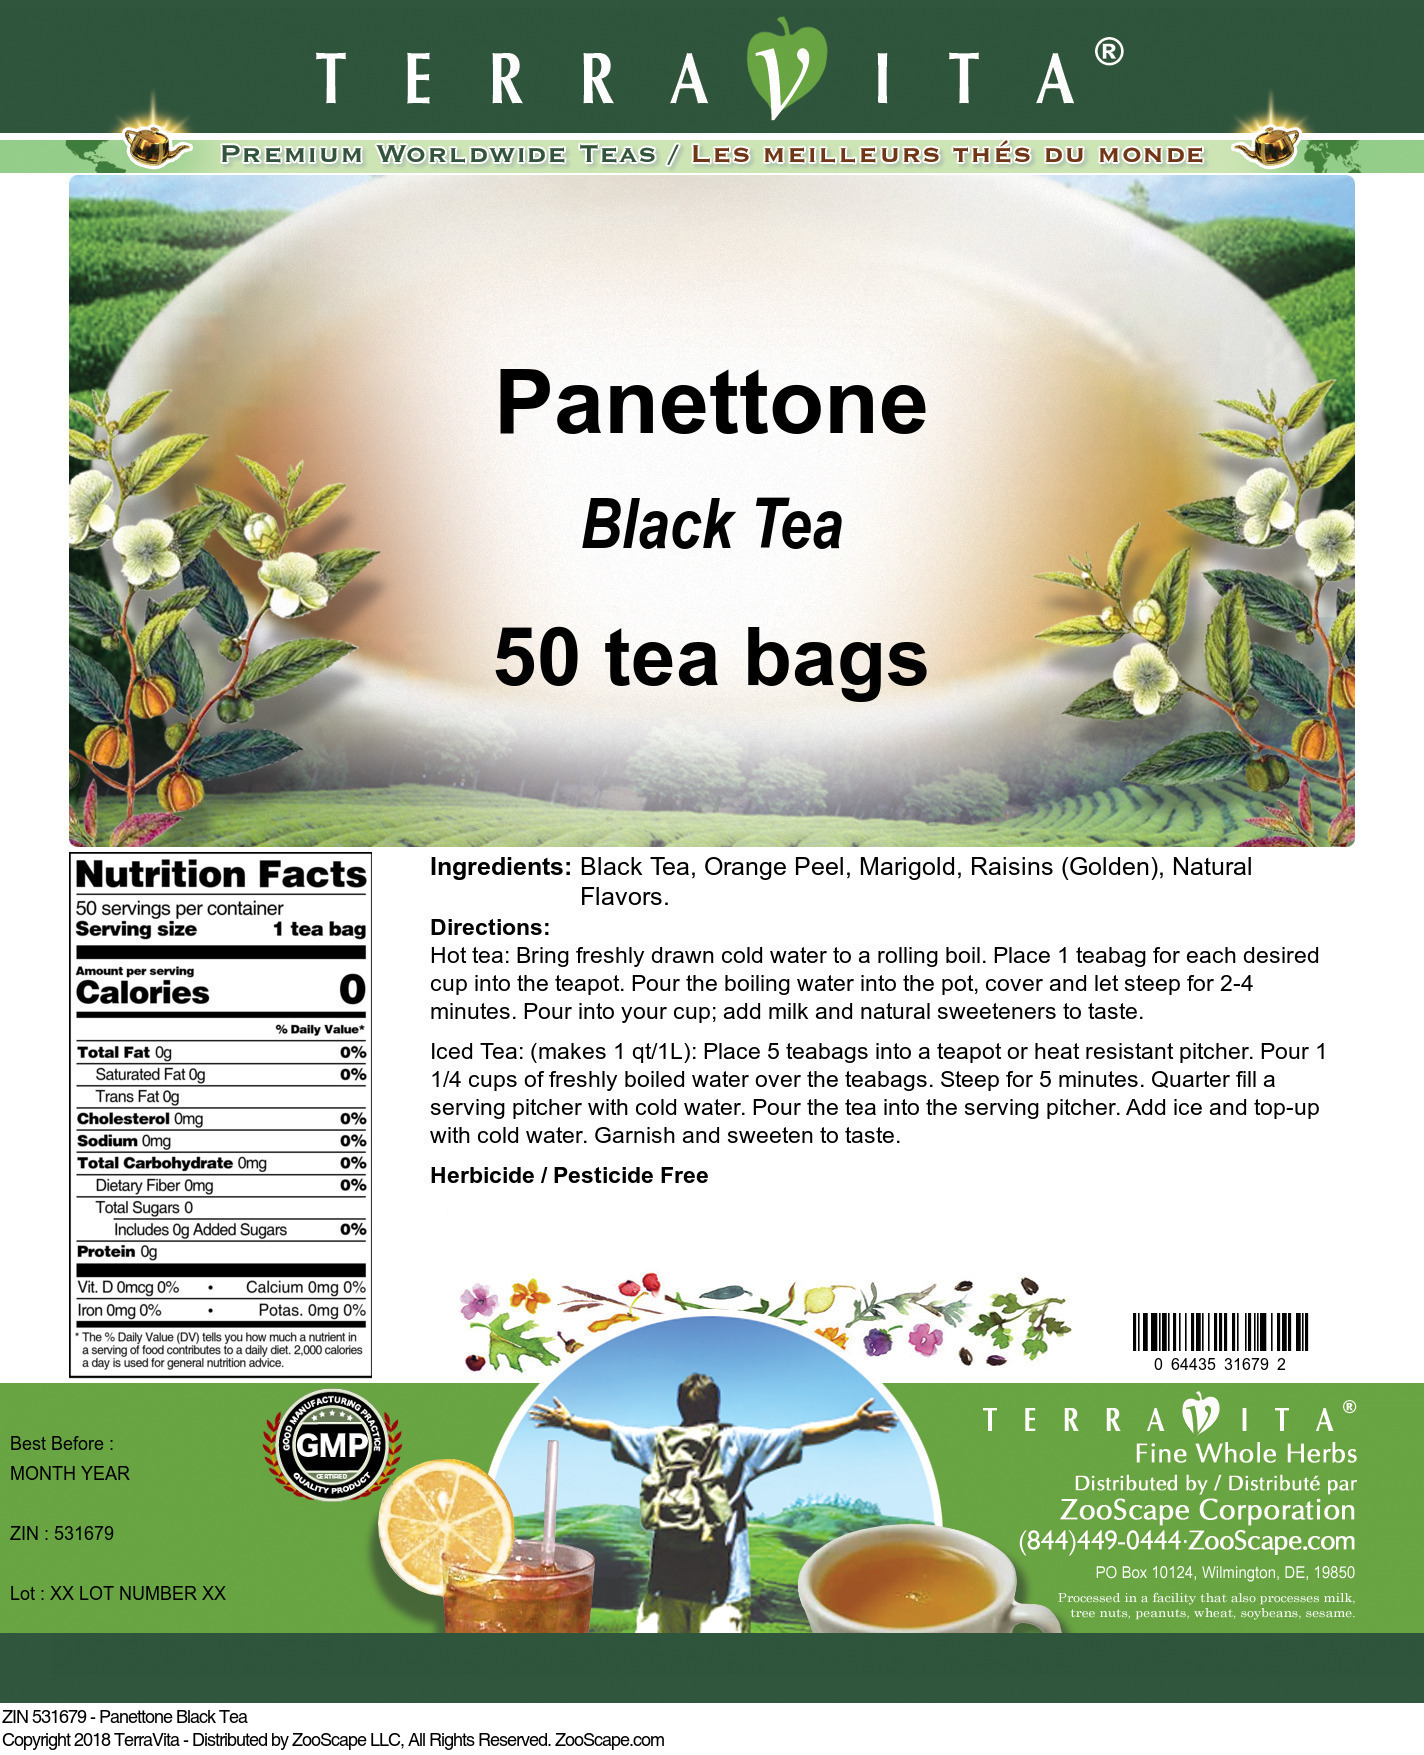 Panettone Black Tea